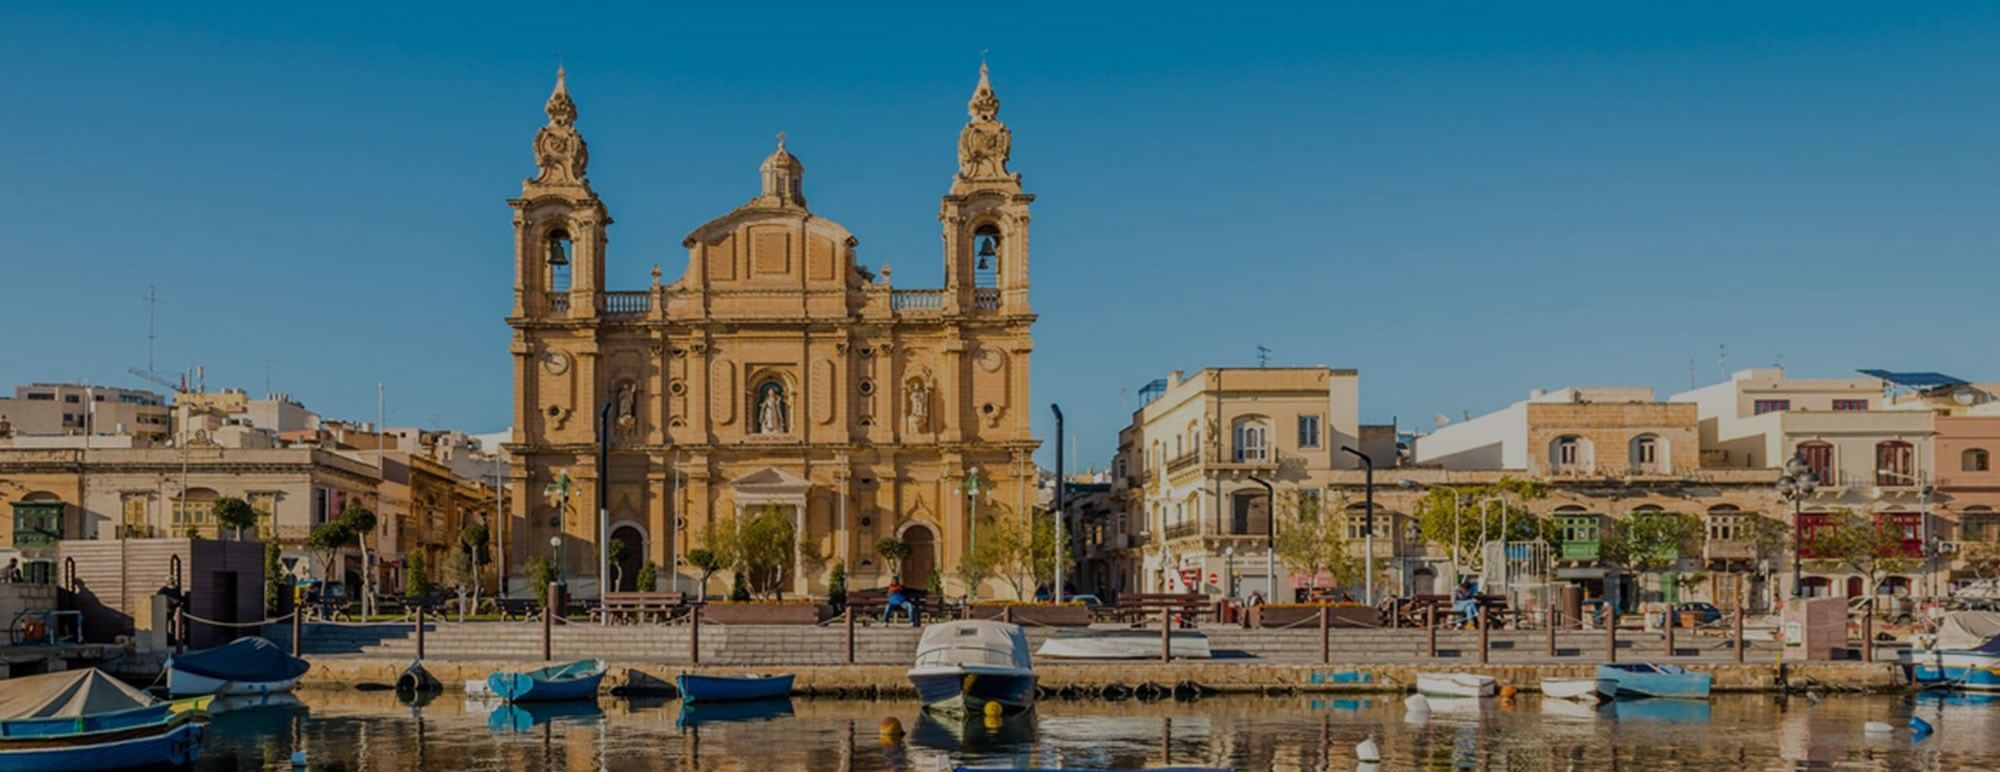 The Weather Page | CasaSoft Ltd. Malta